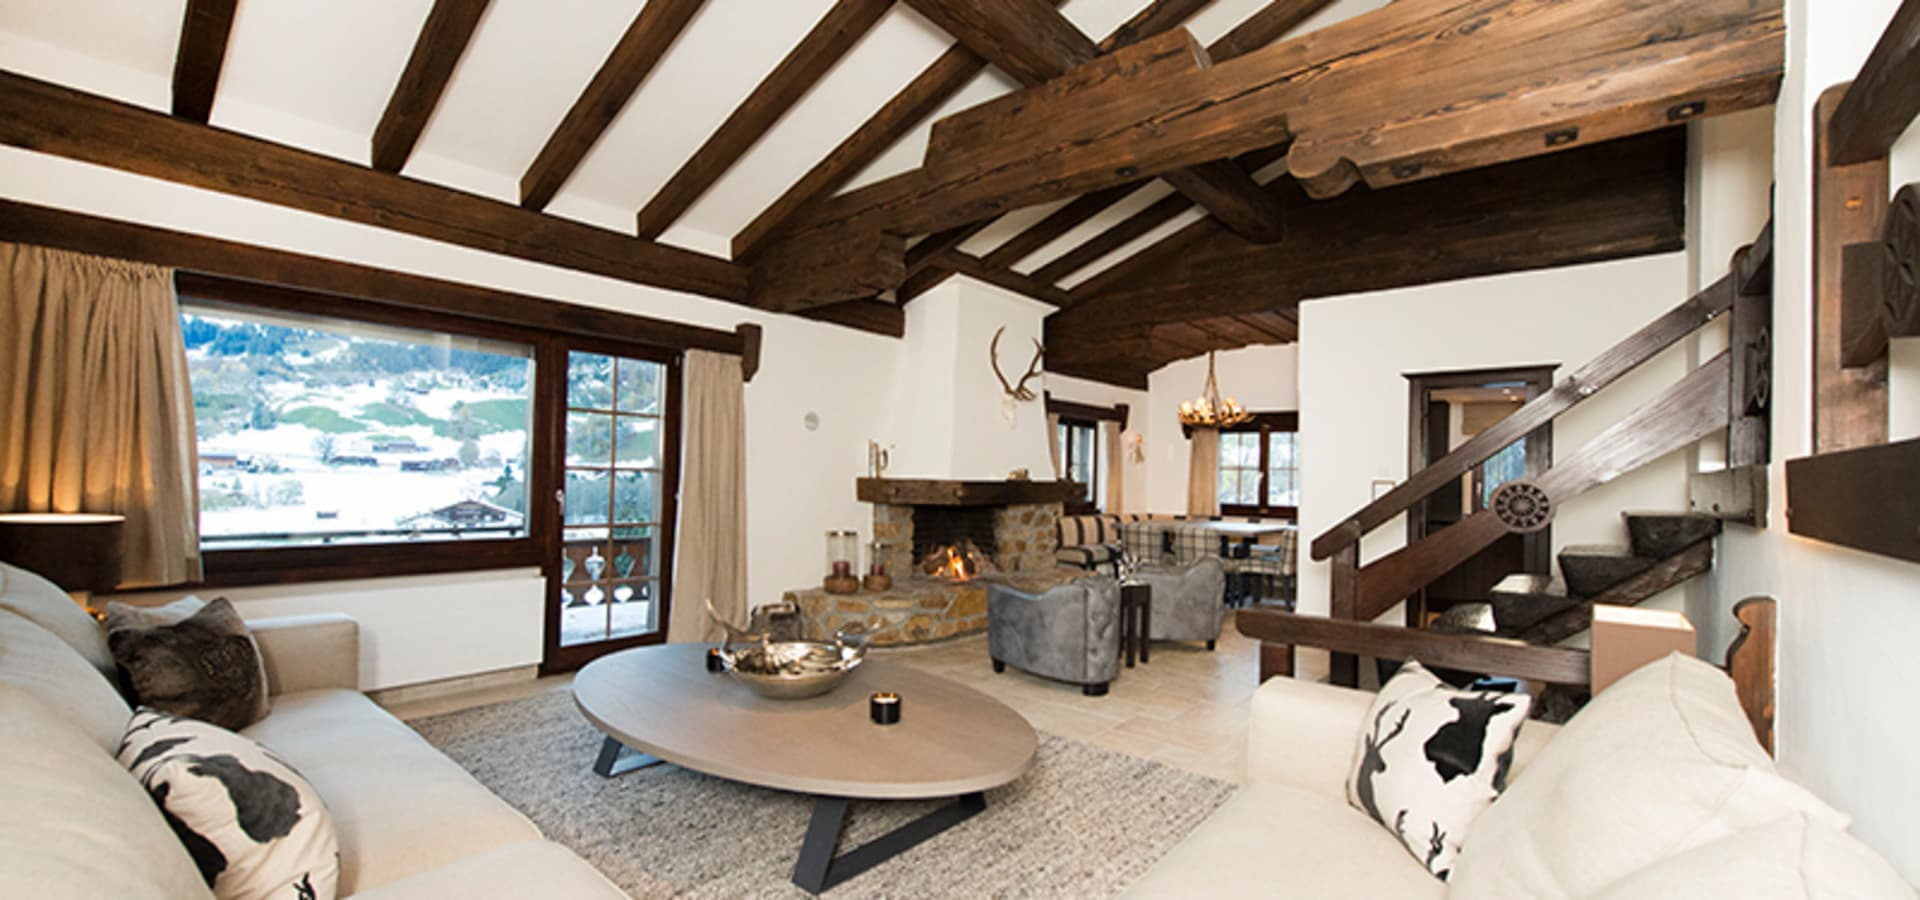 Martinuzzi Interiors Interior Design & Renovations